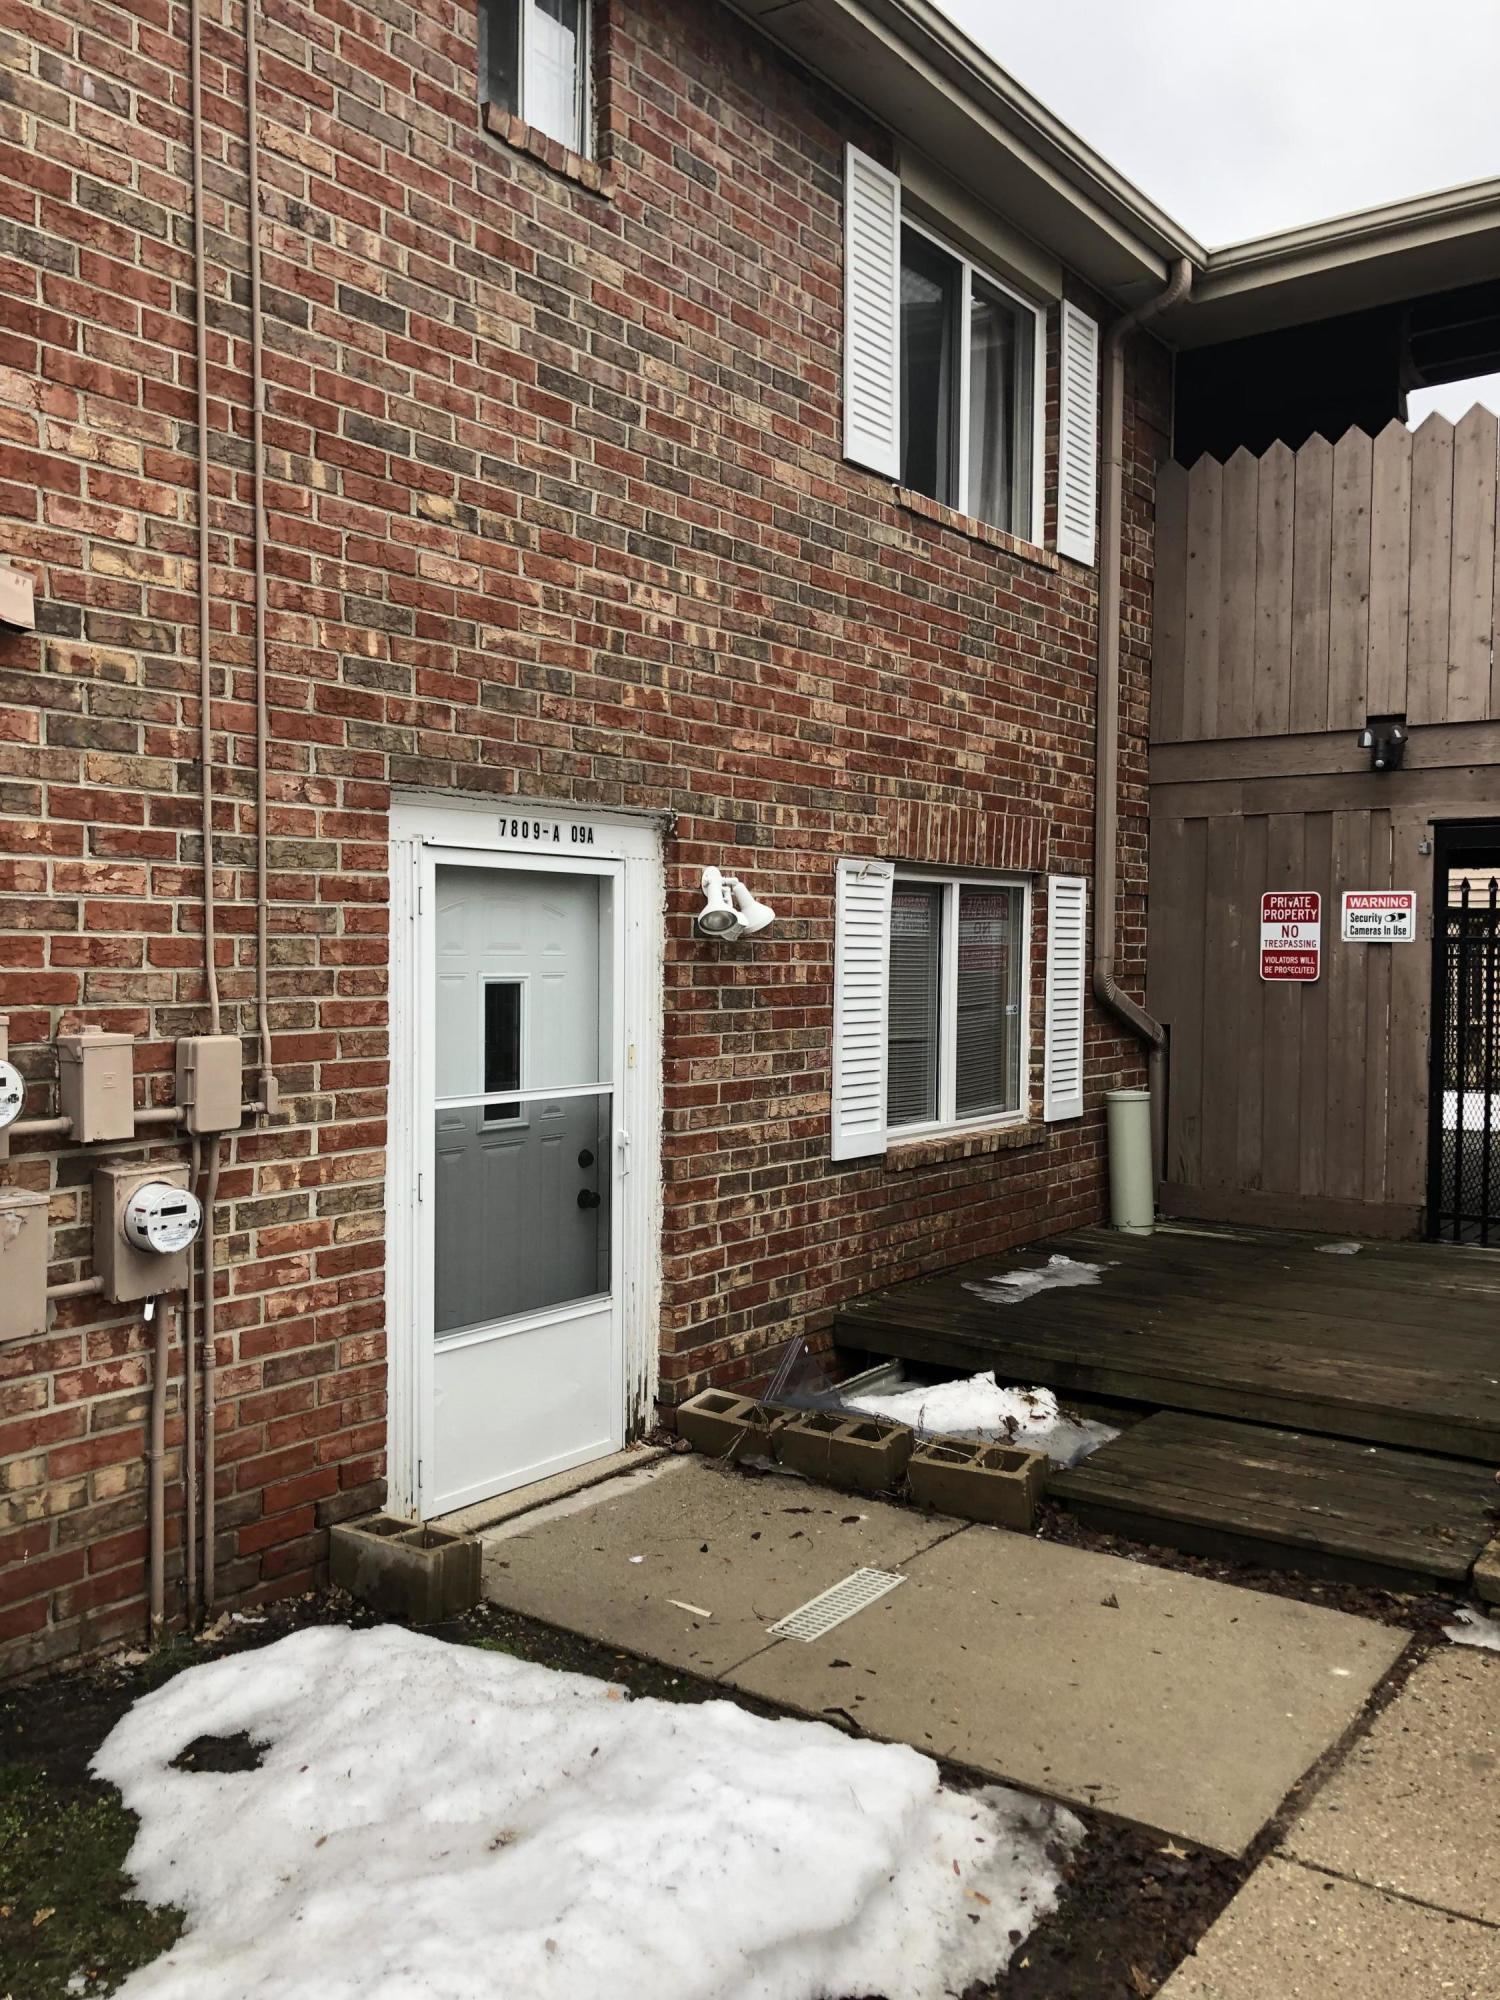 7809 60th St, Milwaukee, Wisconsin 53223, 3 Bedrooms Bedrooms, ,2 BathroomsBathrooms,Condominiums,For Sale,60th St,2,1626511